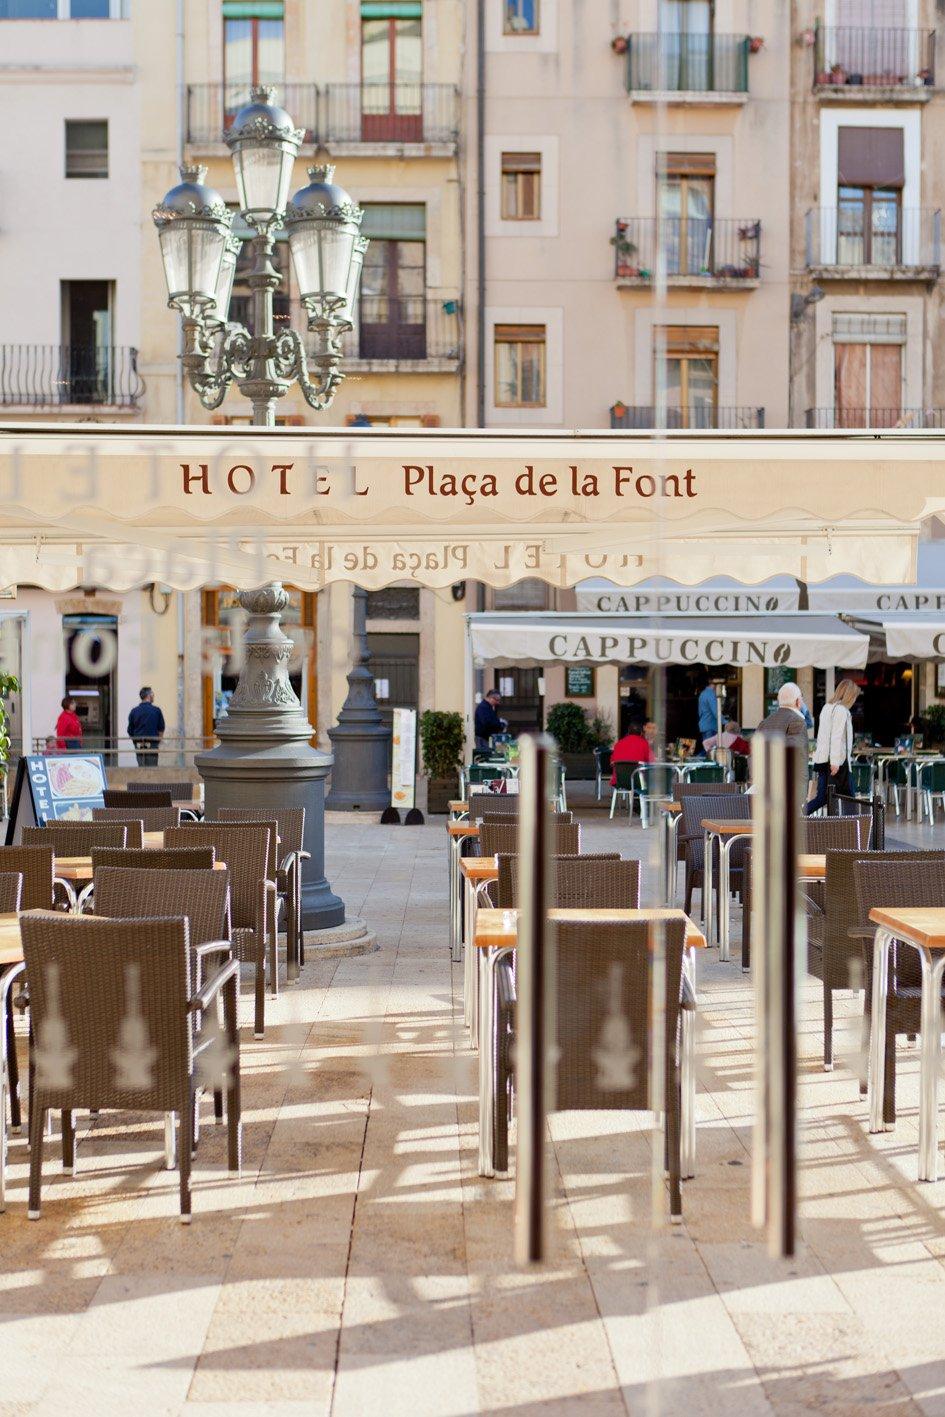 hotel_la_fontnombre_del_documento_21-78dffd42dd8ebe736304317b25c35af2